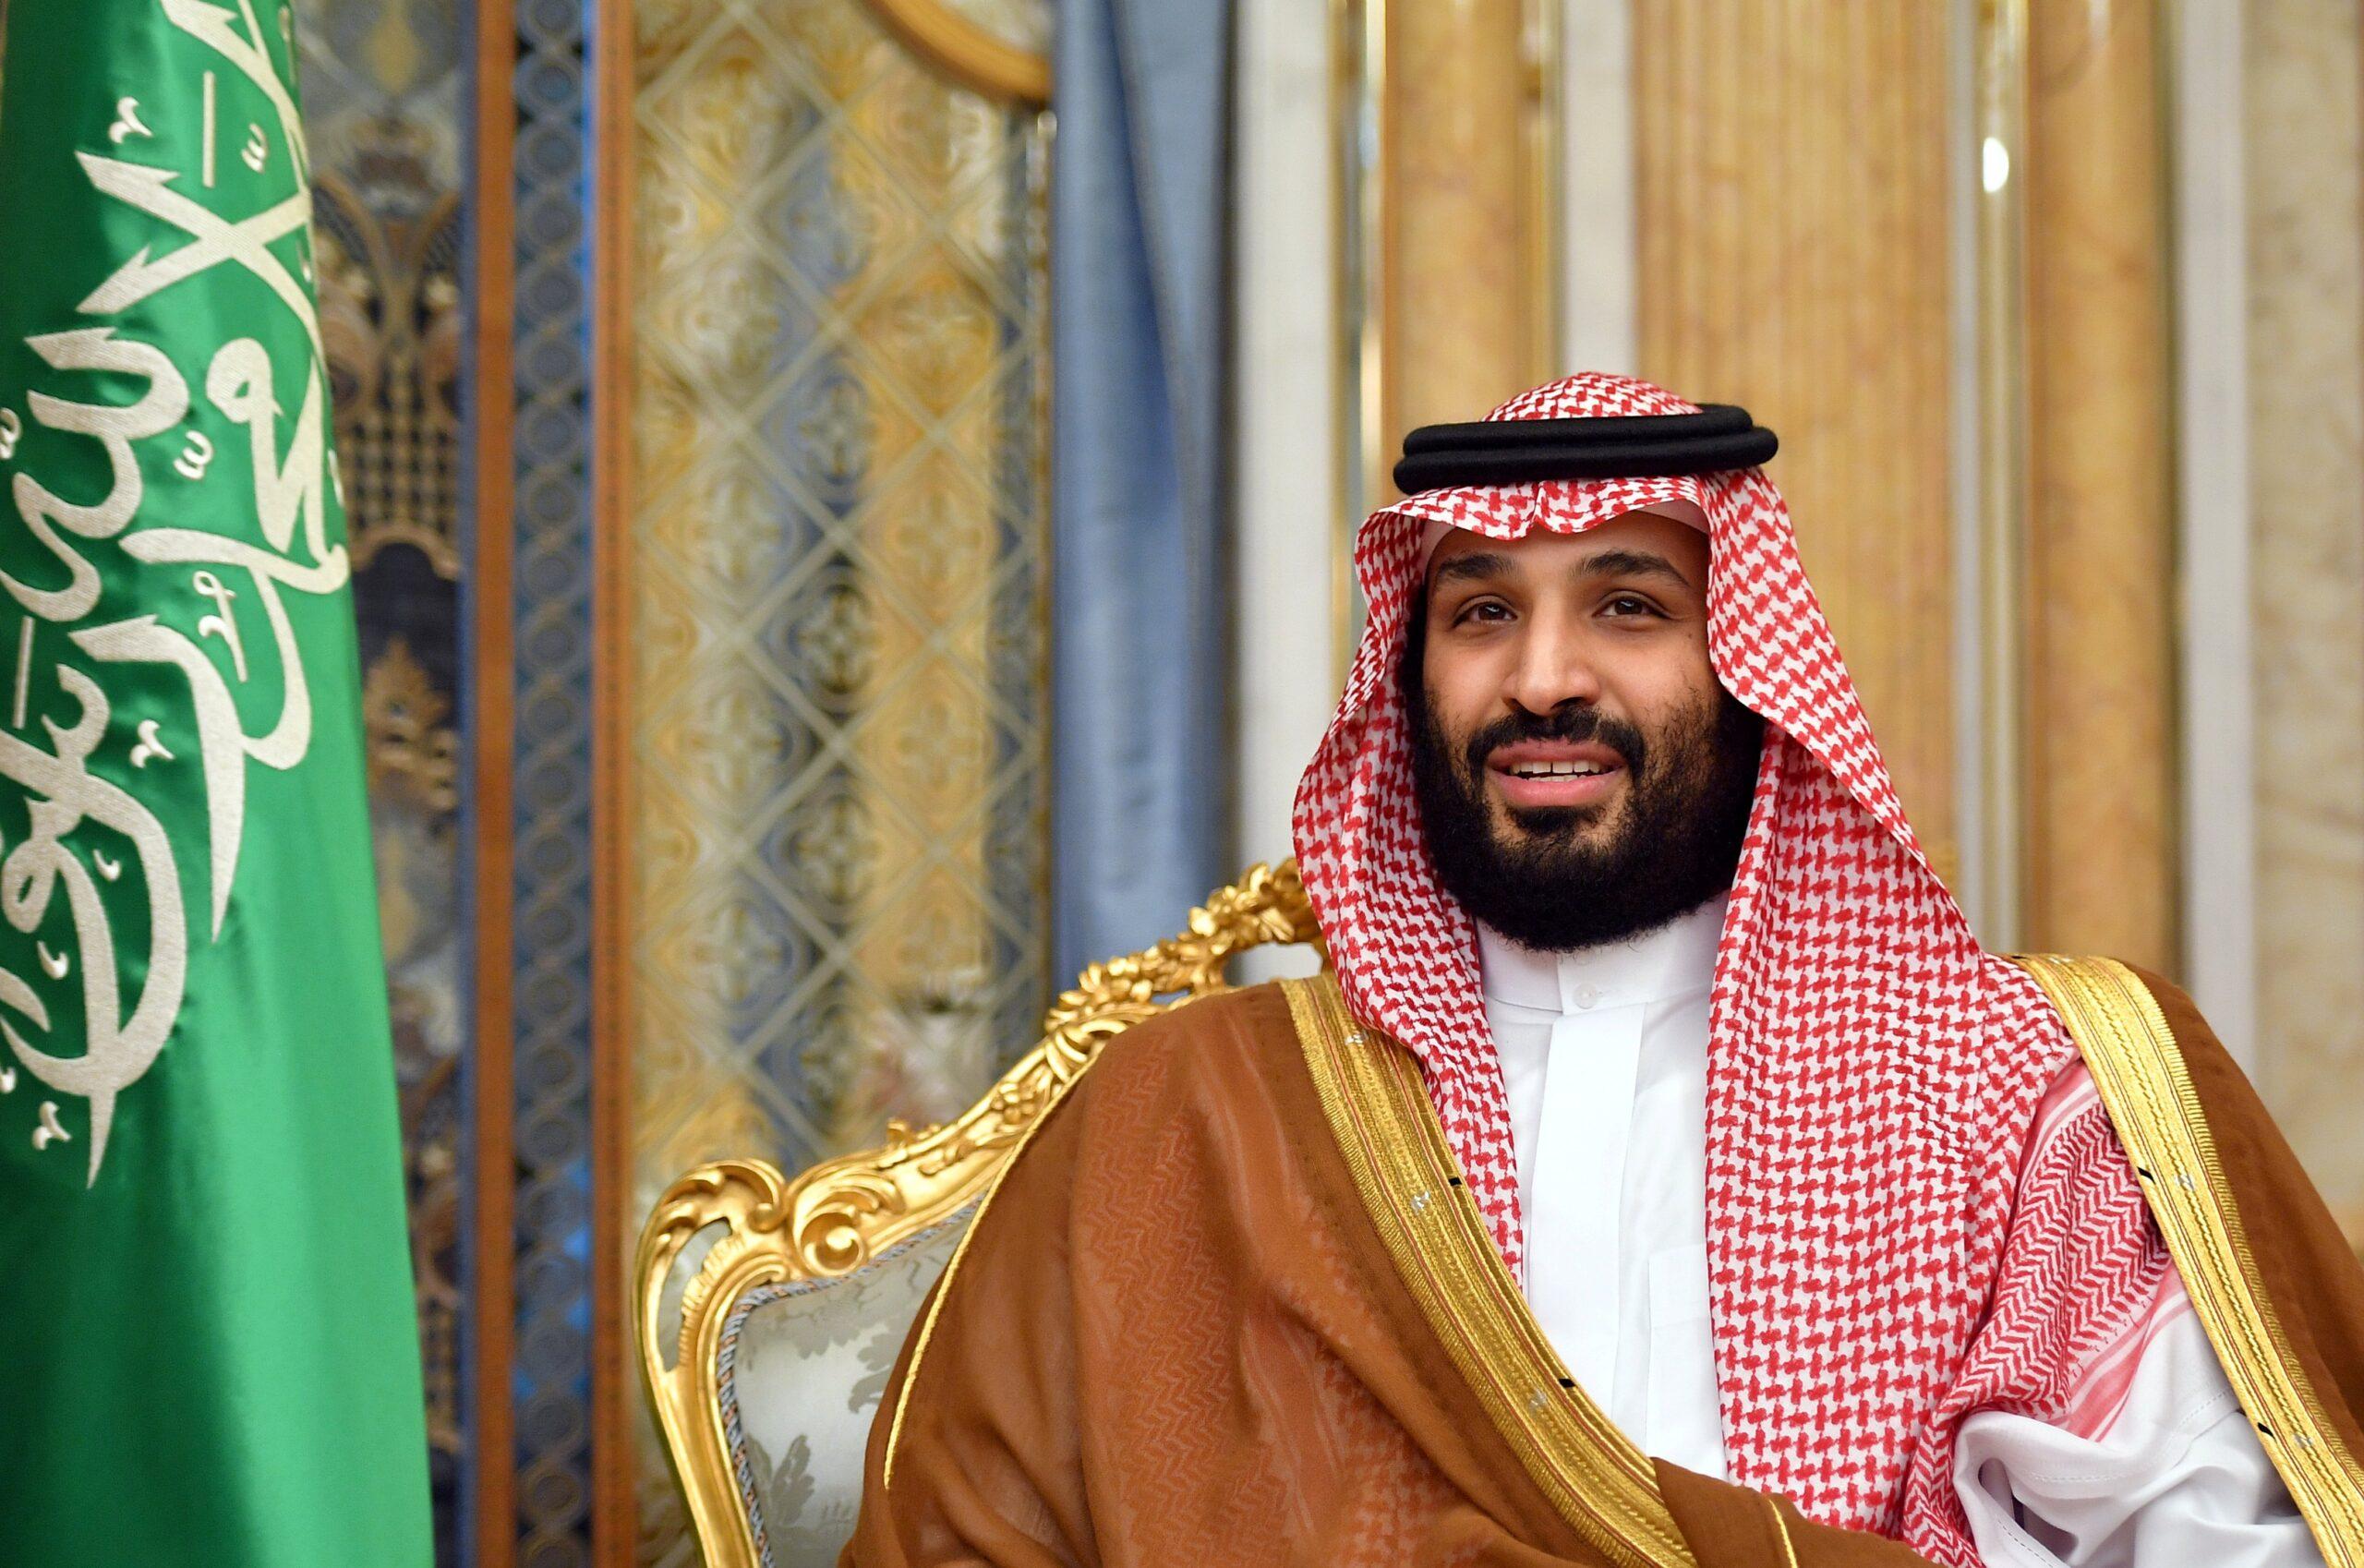 Saudi Crown Prince Muhammad Bin Salman To Visit Pakistan For Hunting